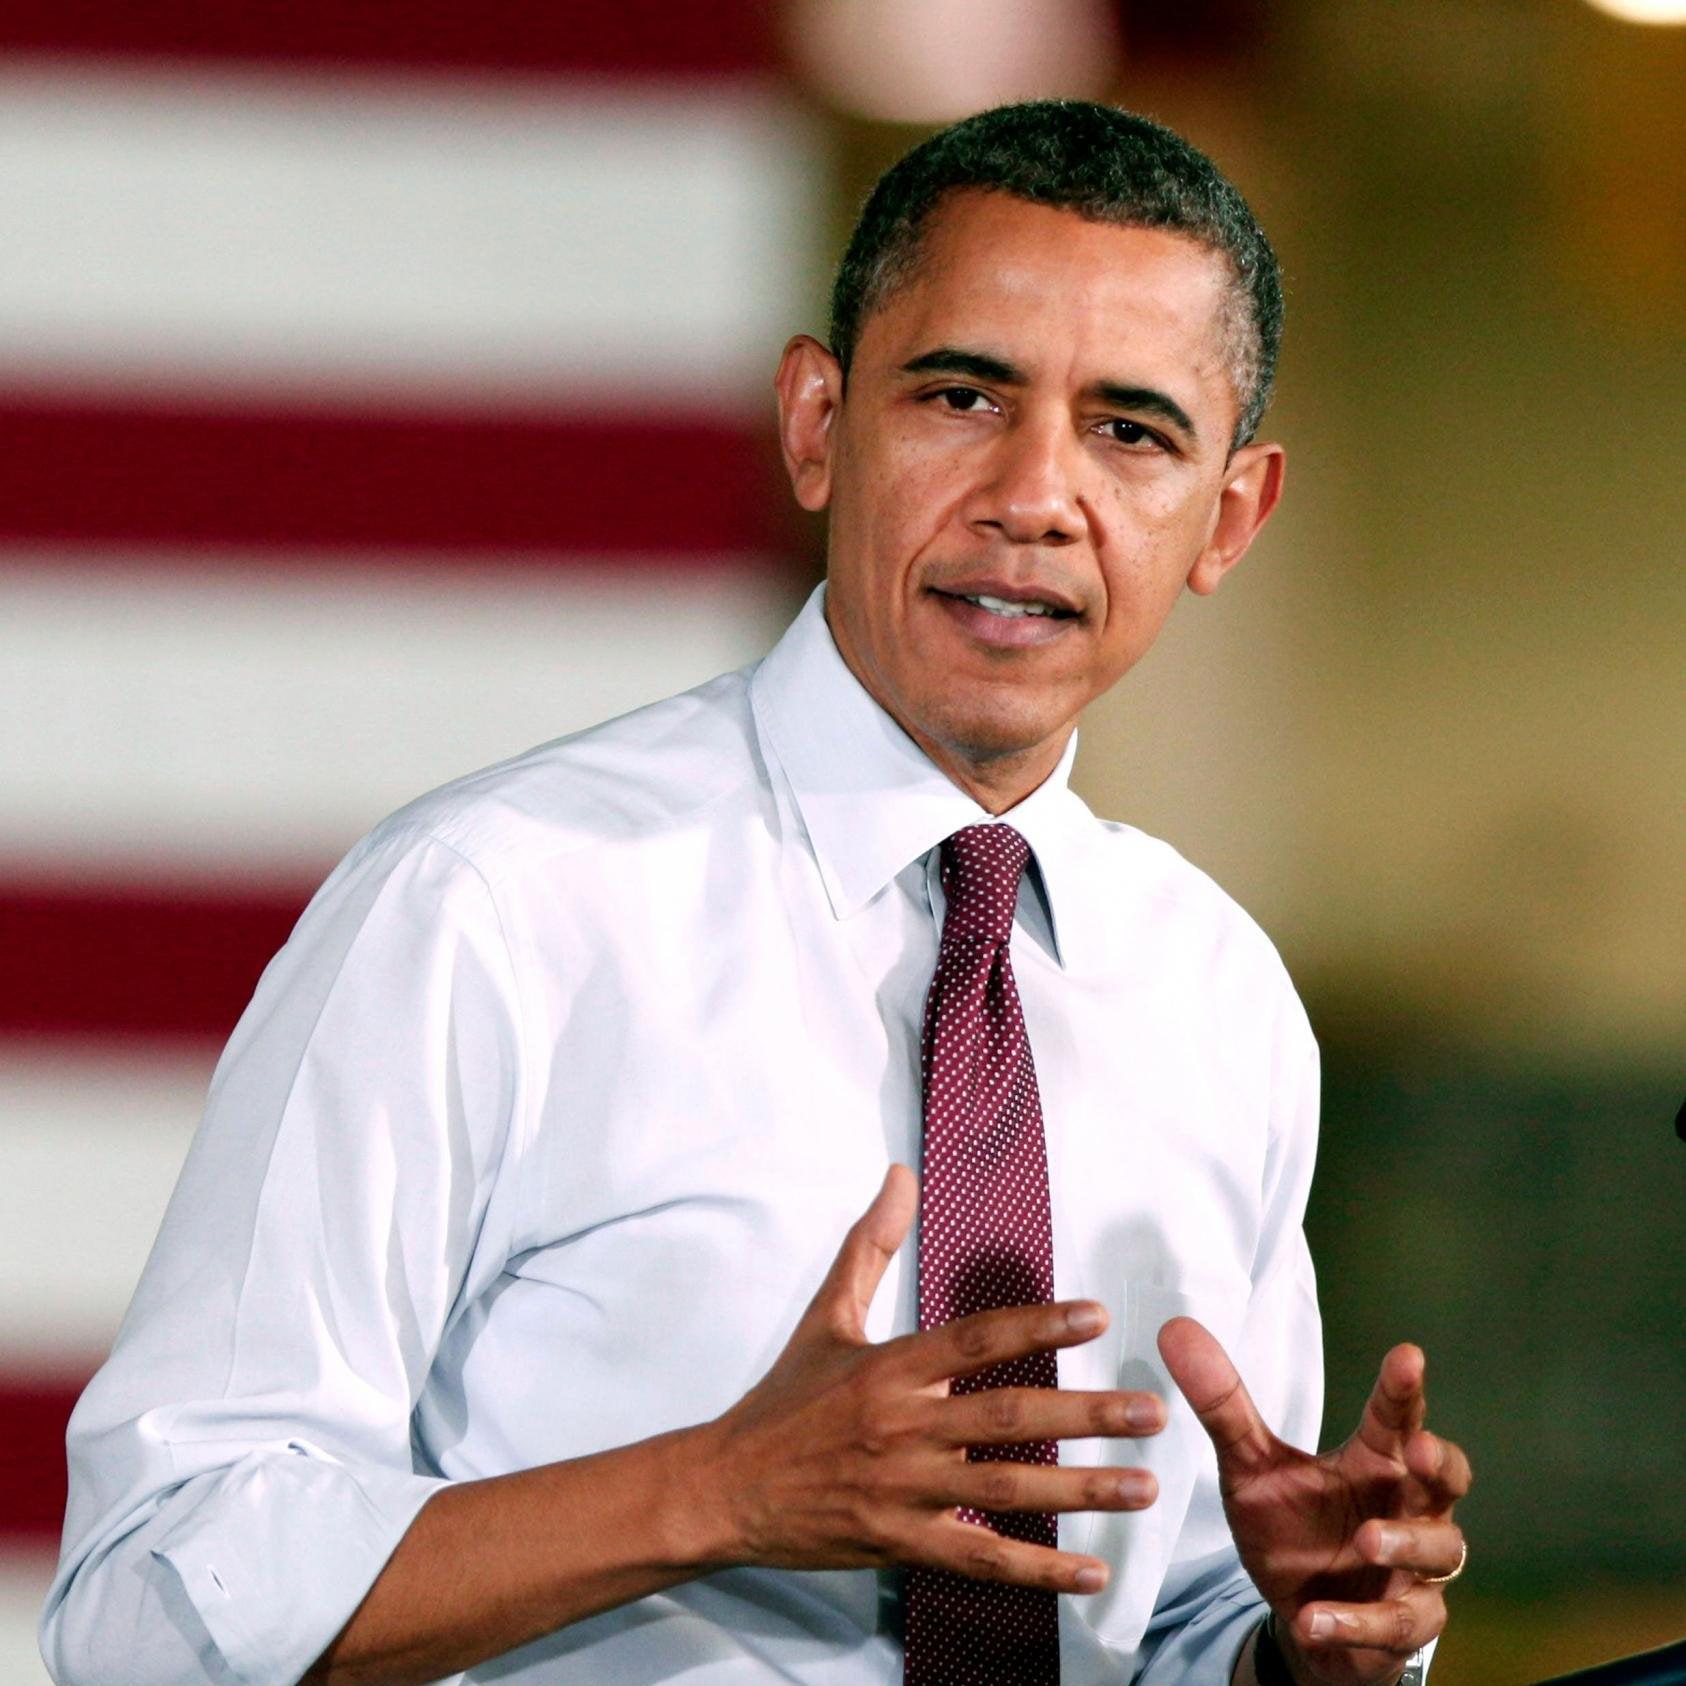 President Obama to Deliver Morehouse Graduation Speech